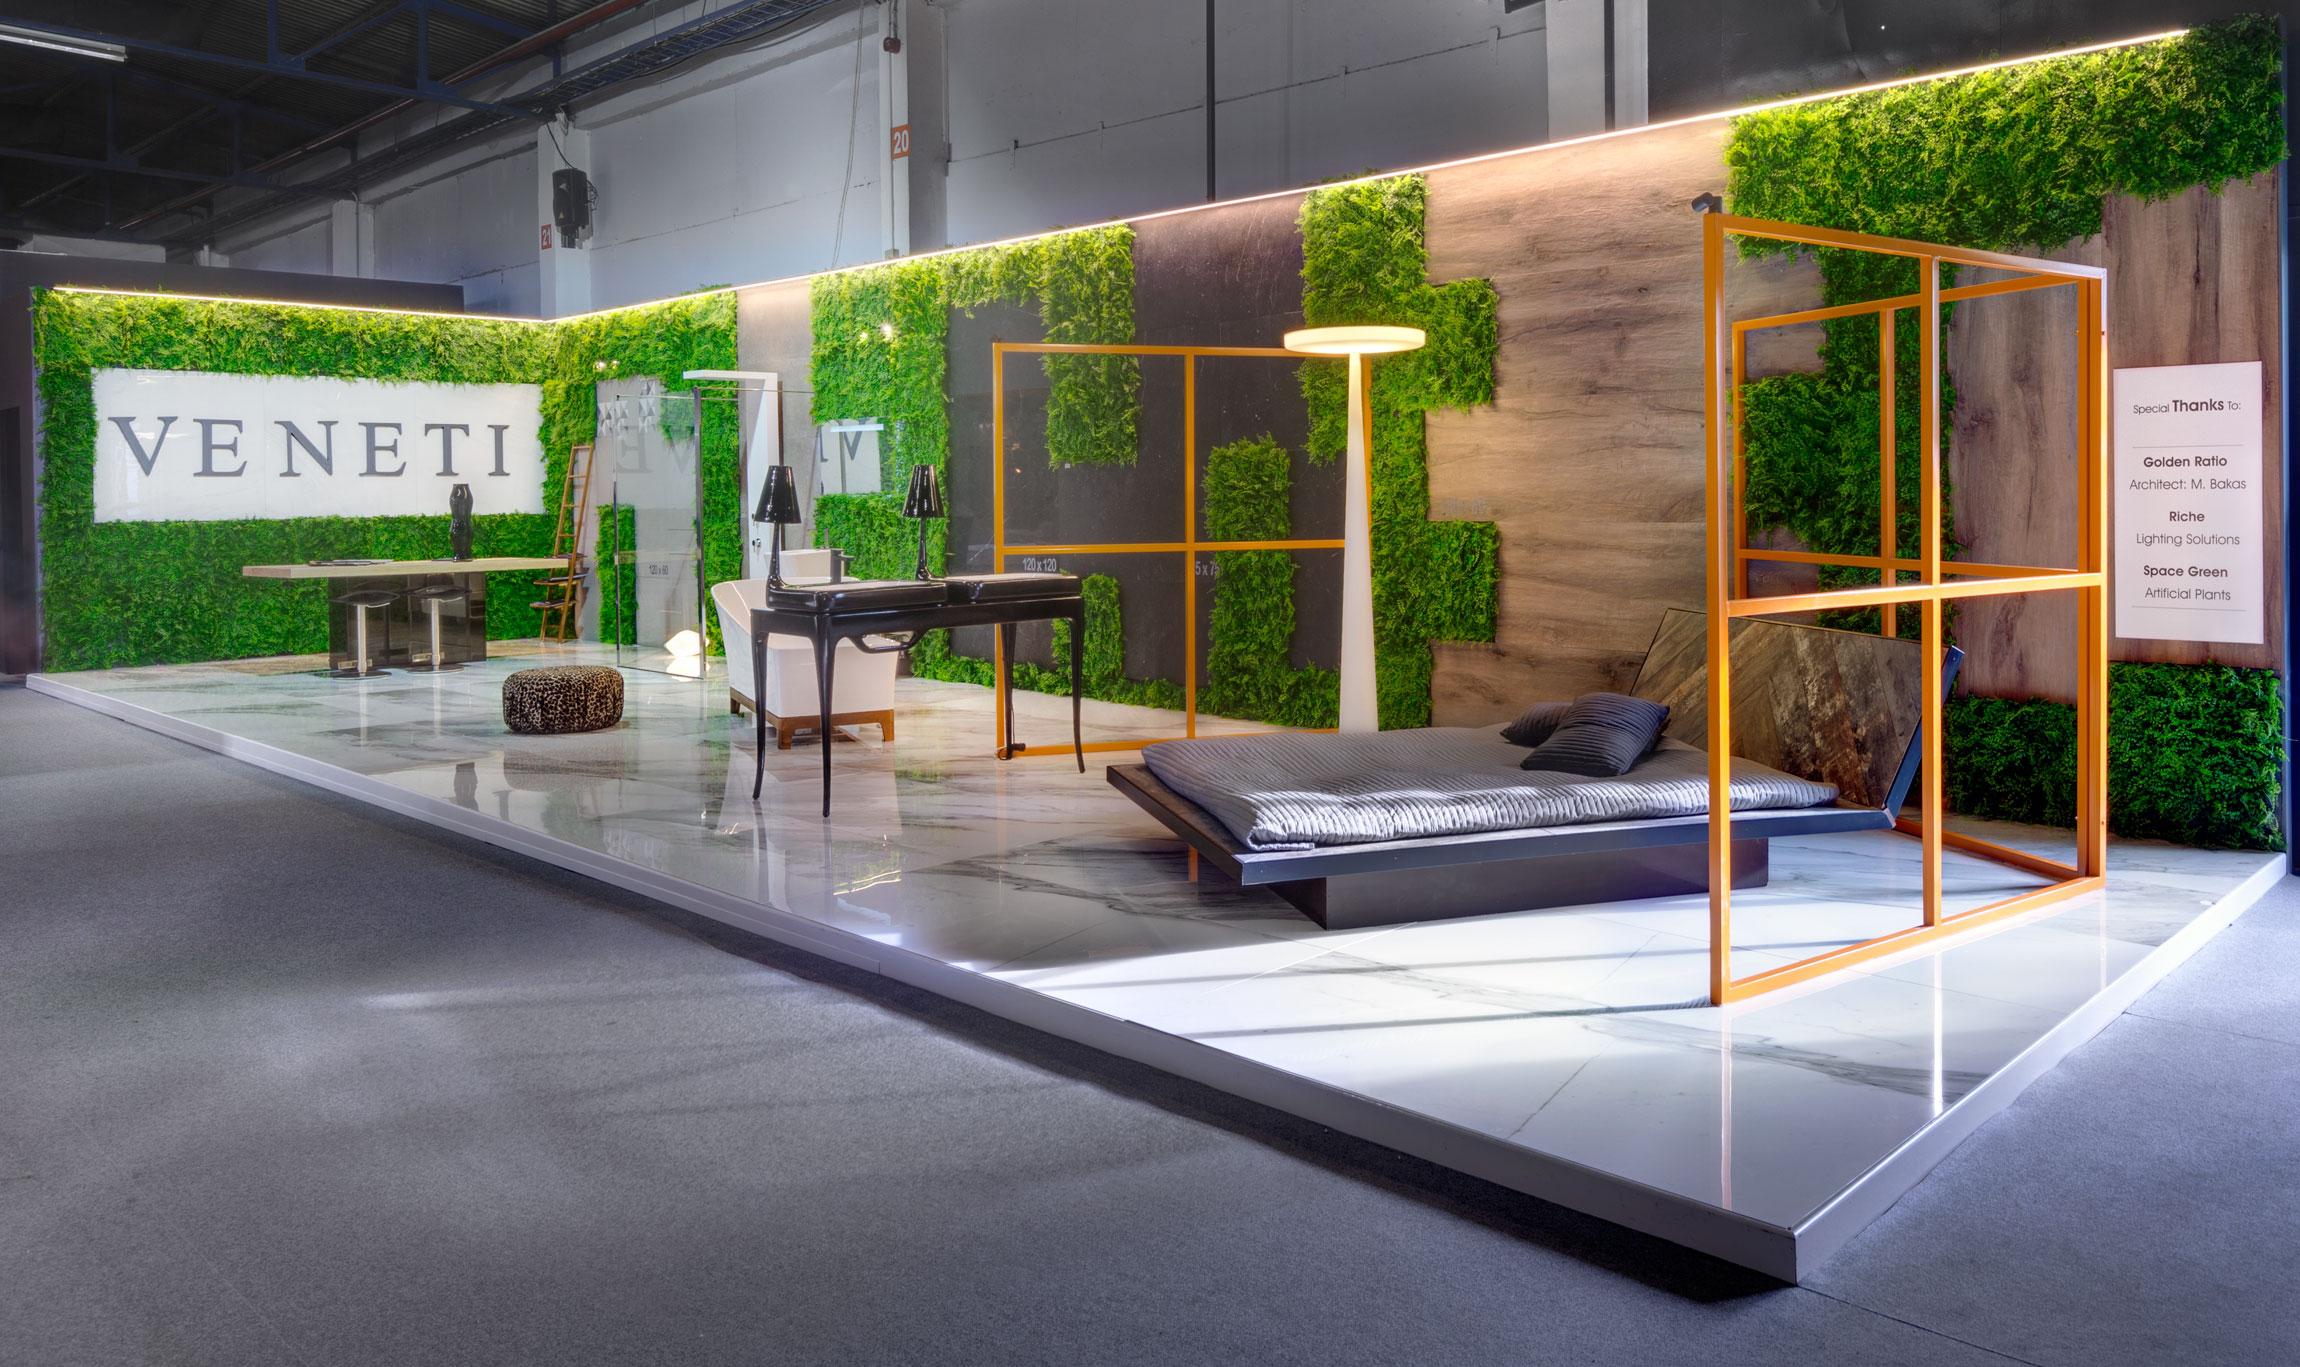 Veneti Pavillion Design At 100 Hotelshow2016 Architect